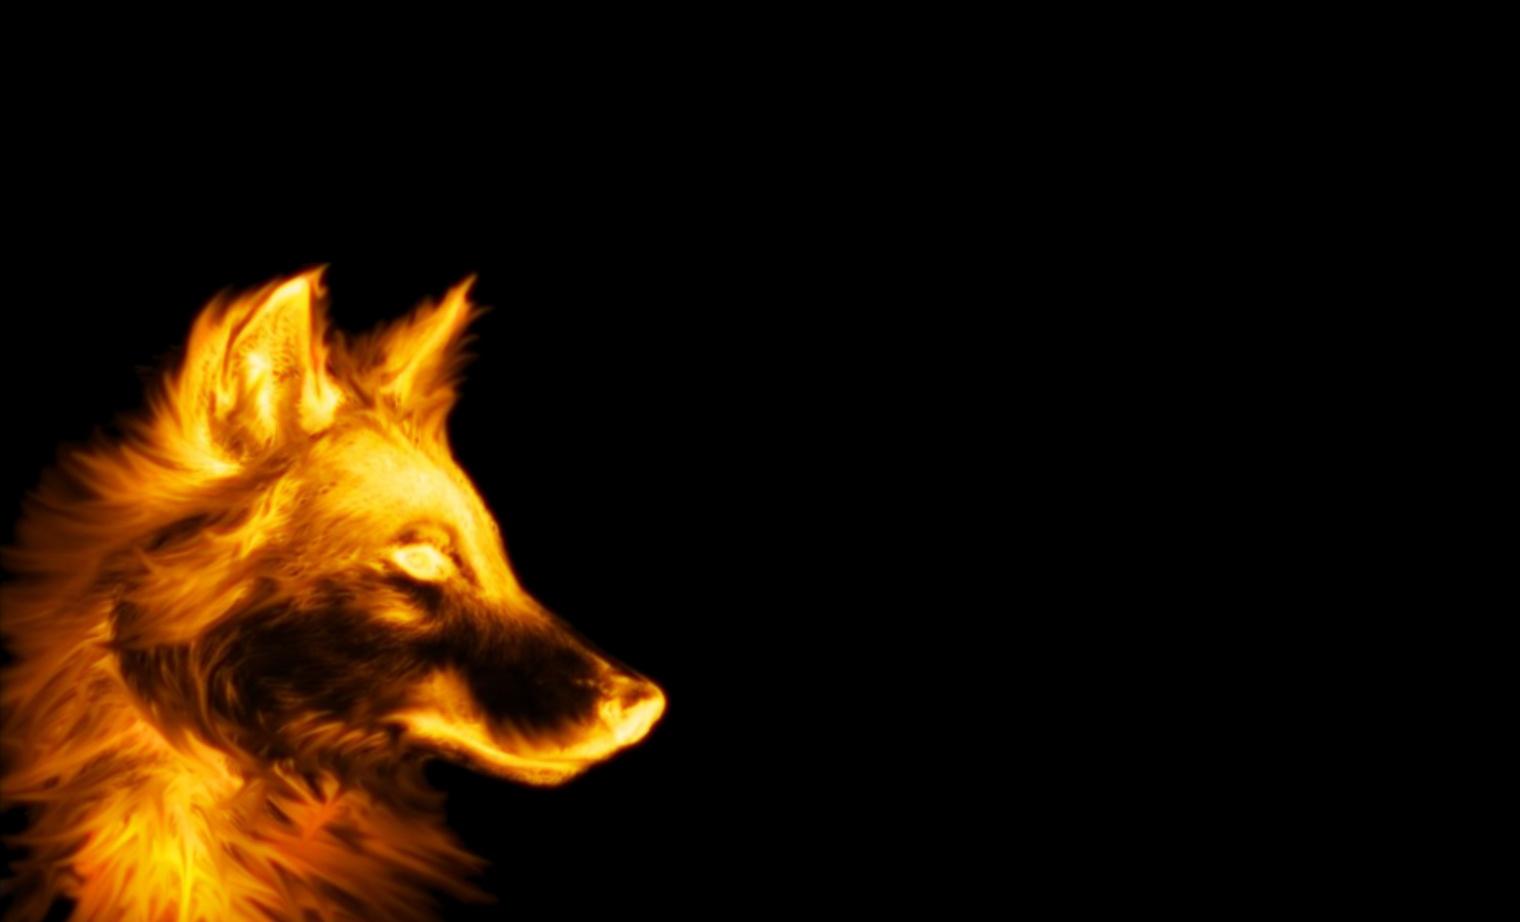 Desktop Cool Wolf Wallpaper Download 3d Hd Colour Design Cool Wallpapers Dogs 1520x922 Wallpaper Teahub Io